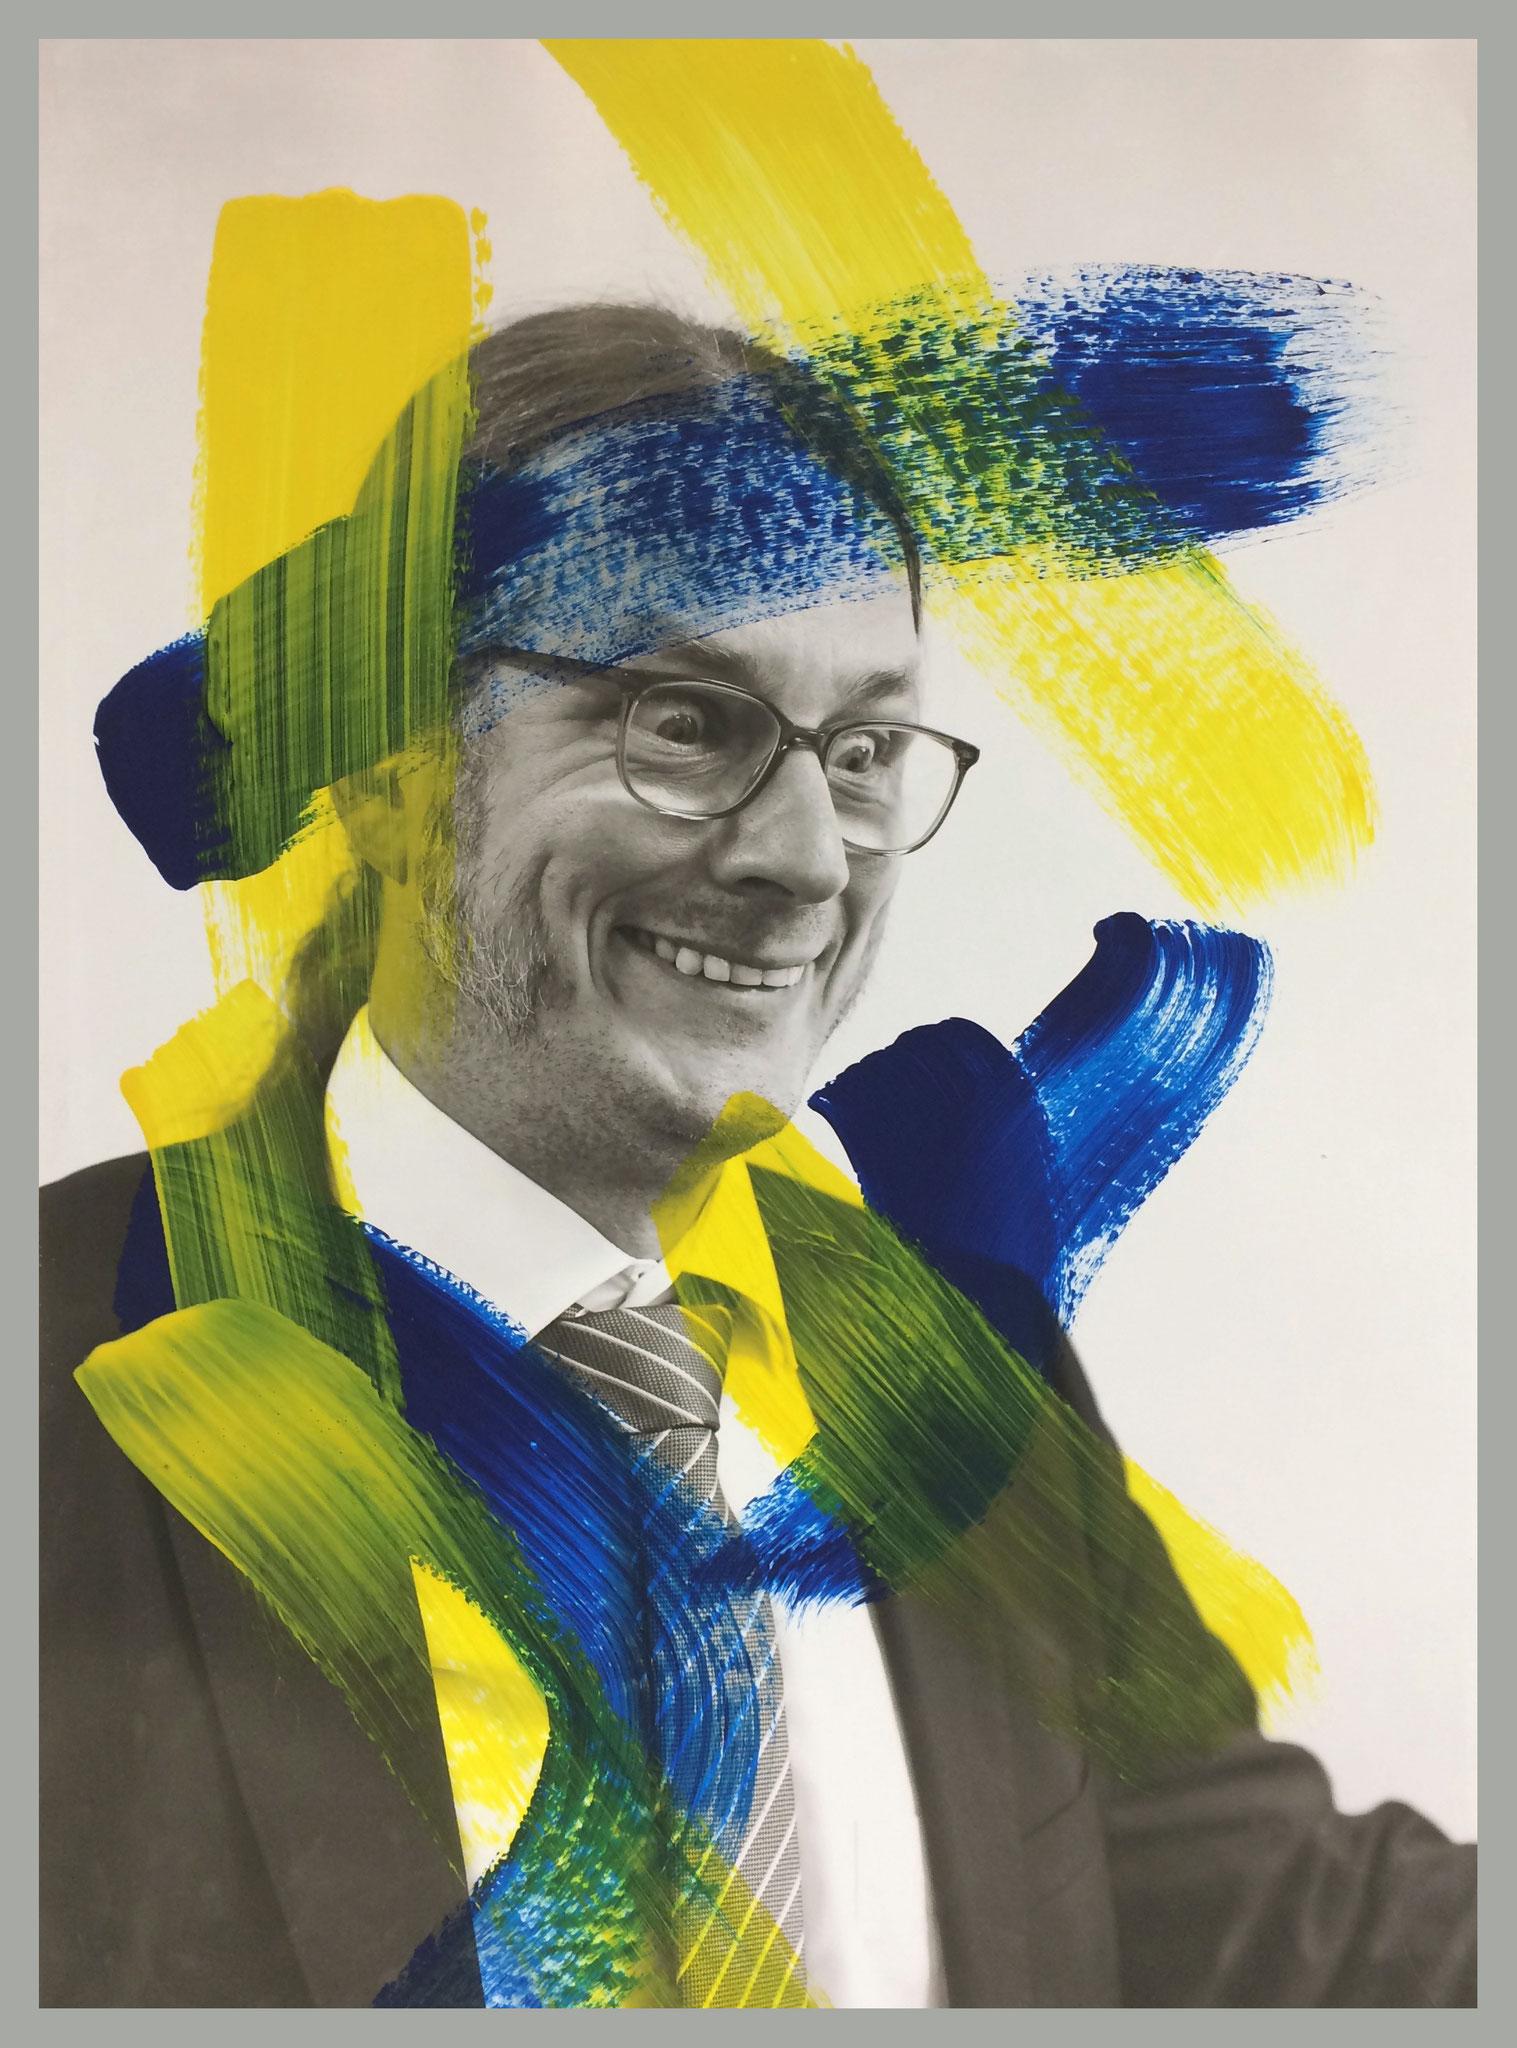 Dominik Pichler à la Arnulf Rainer, © Malte Fiedler